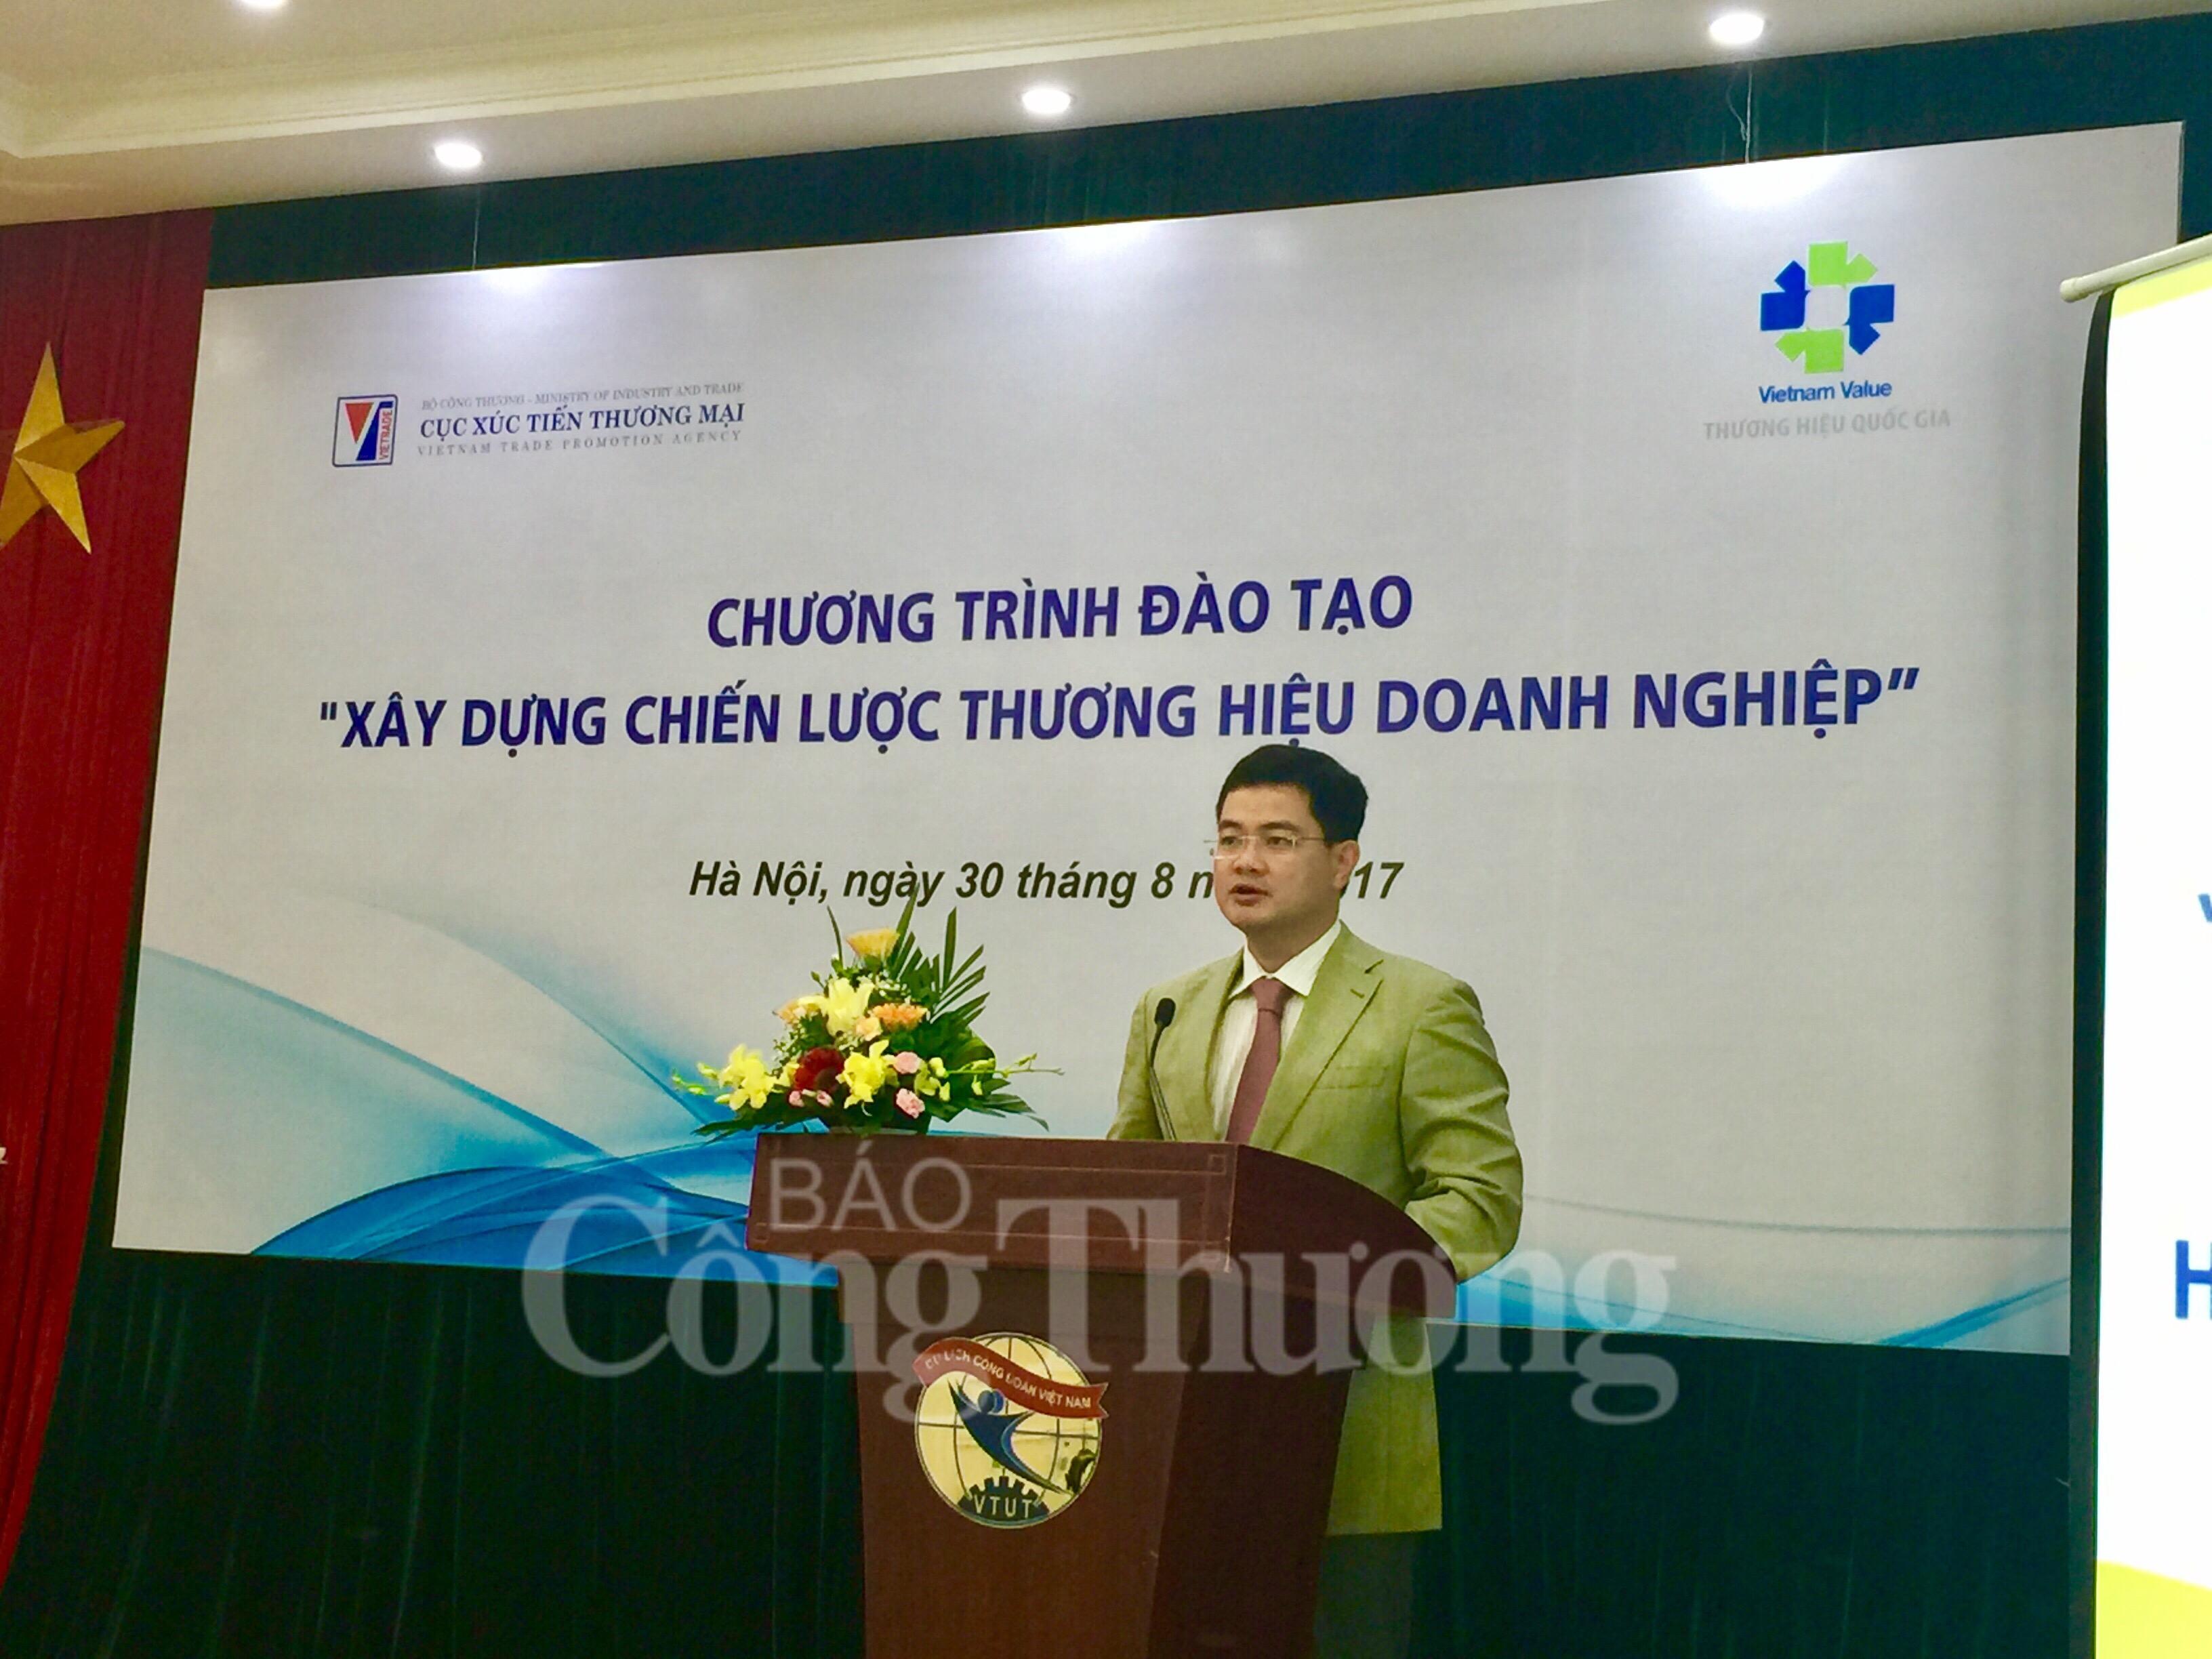 tao dung ban sac cho thuong hieu doanh nghiep viet nam